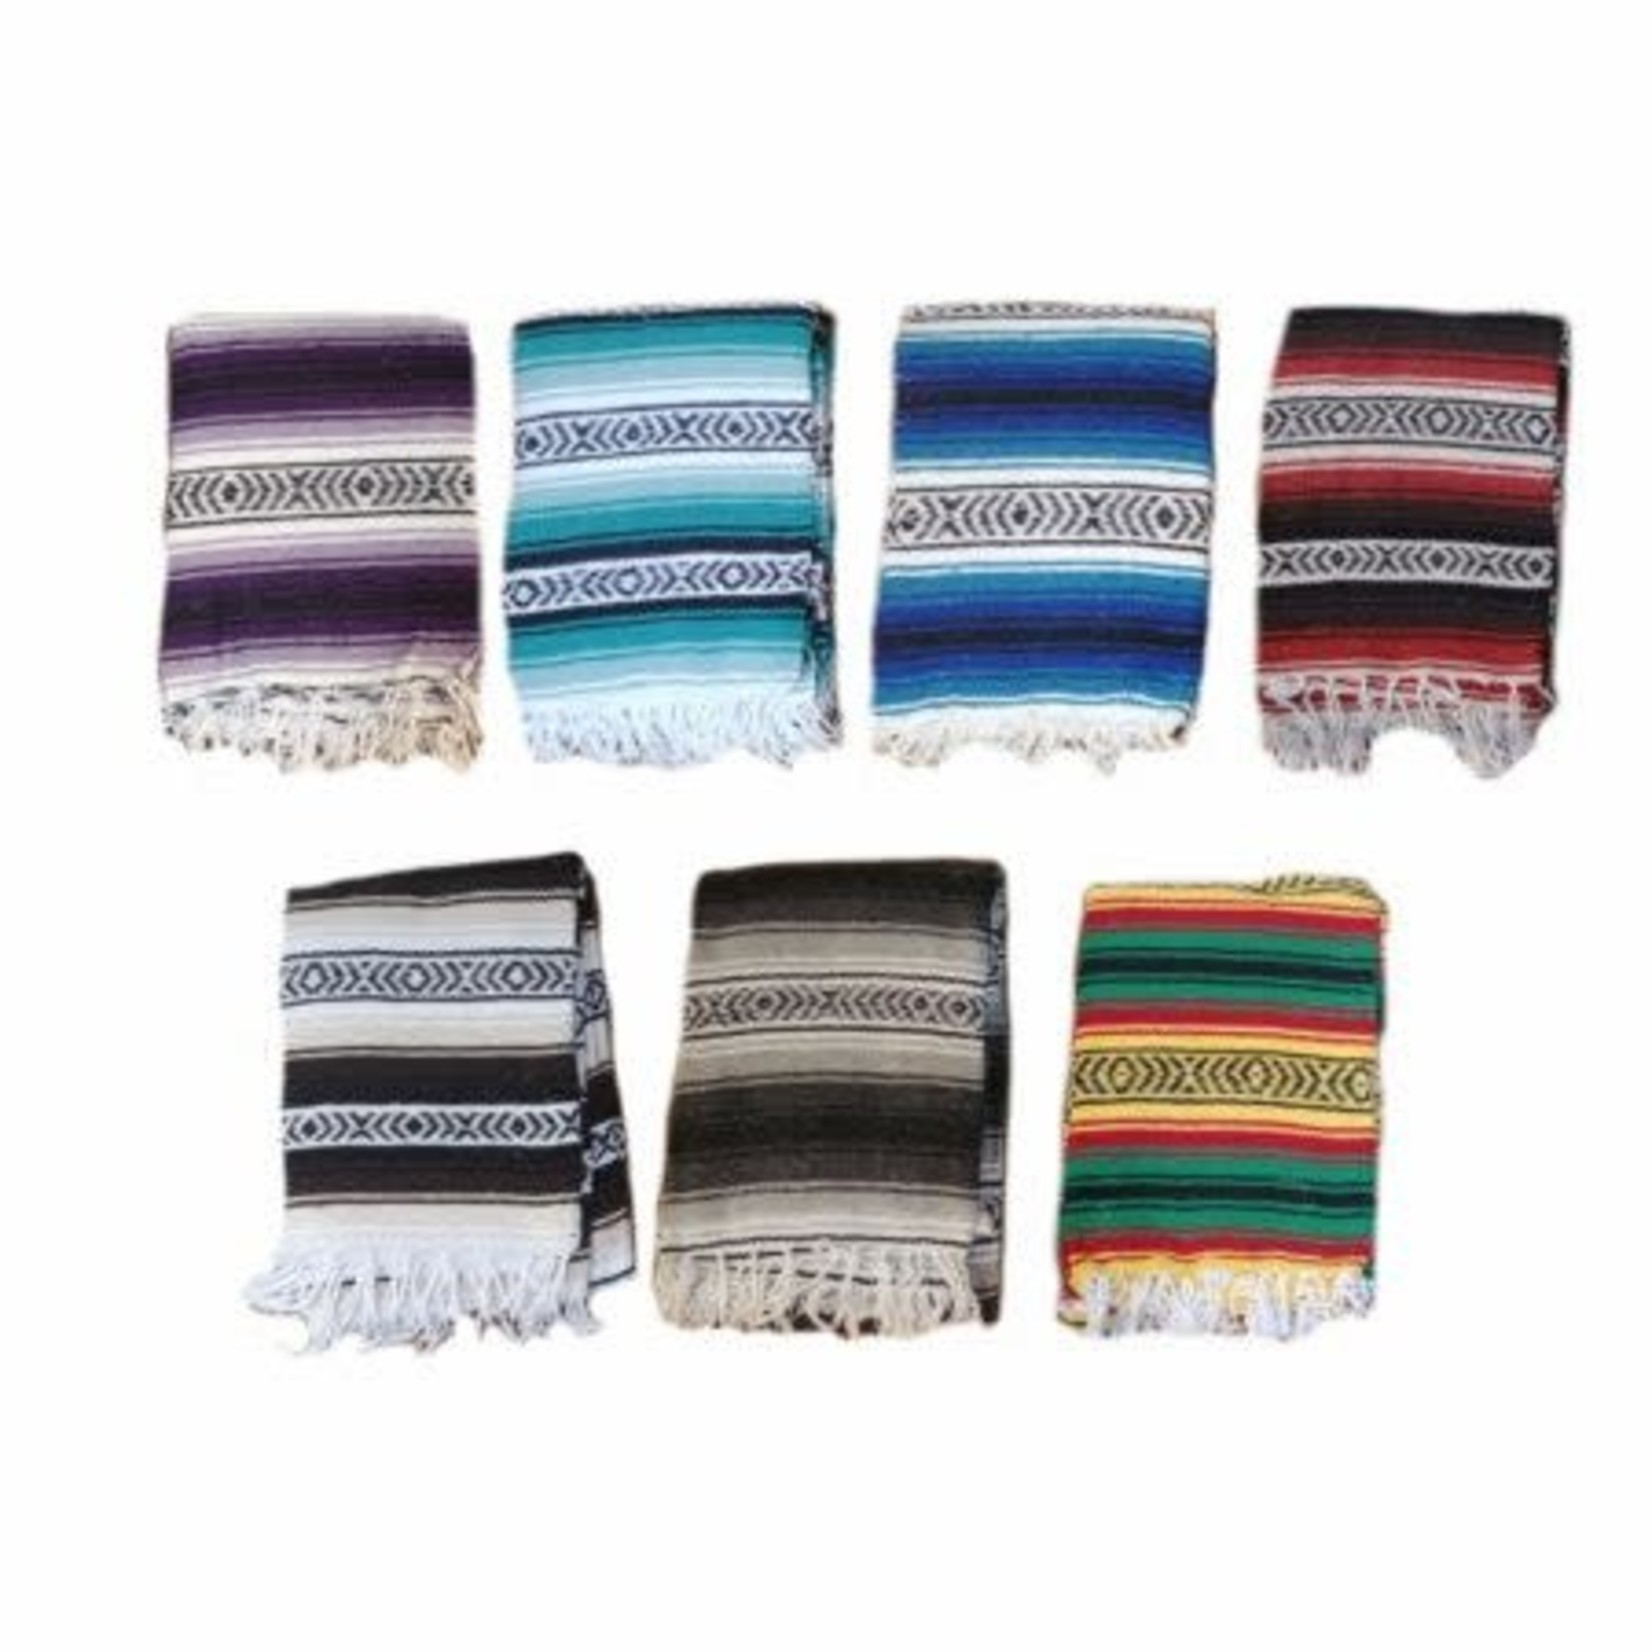 Sercal Mexican Blanket.